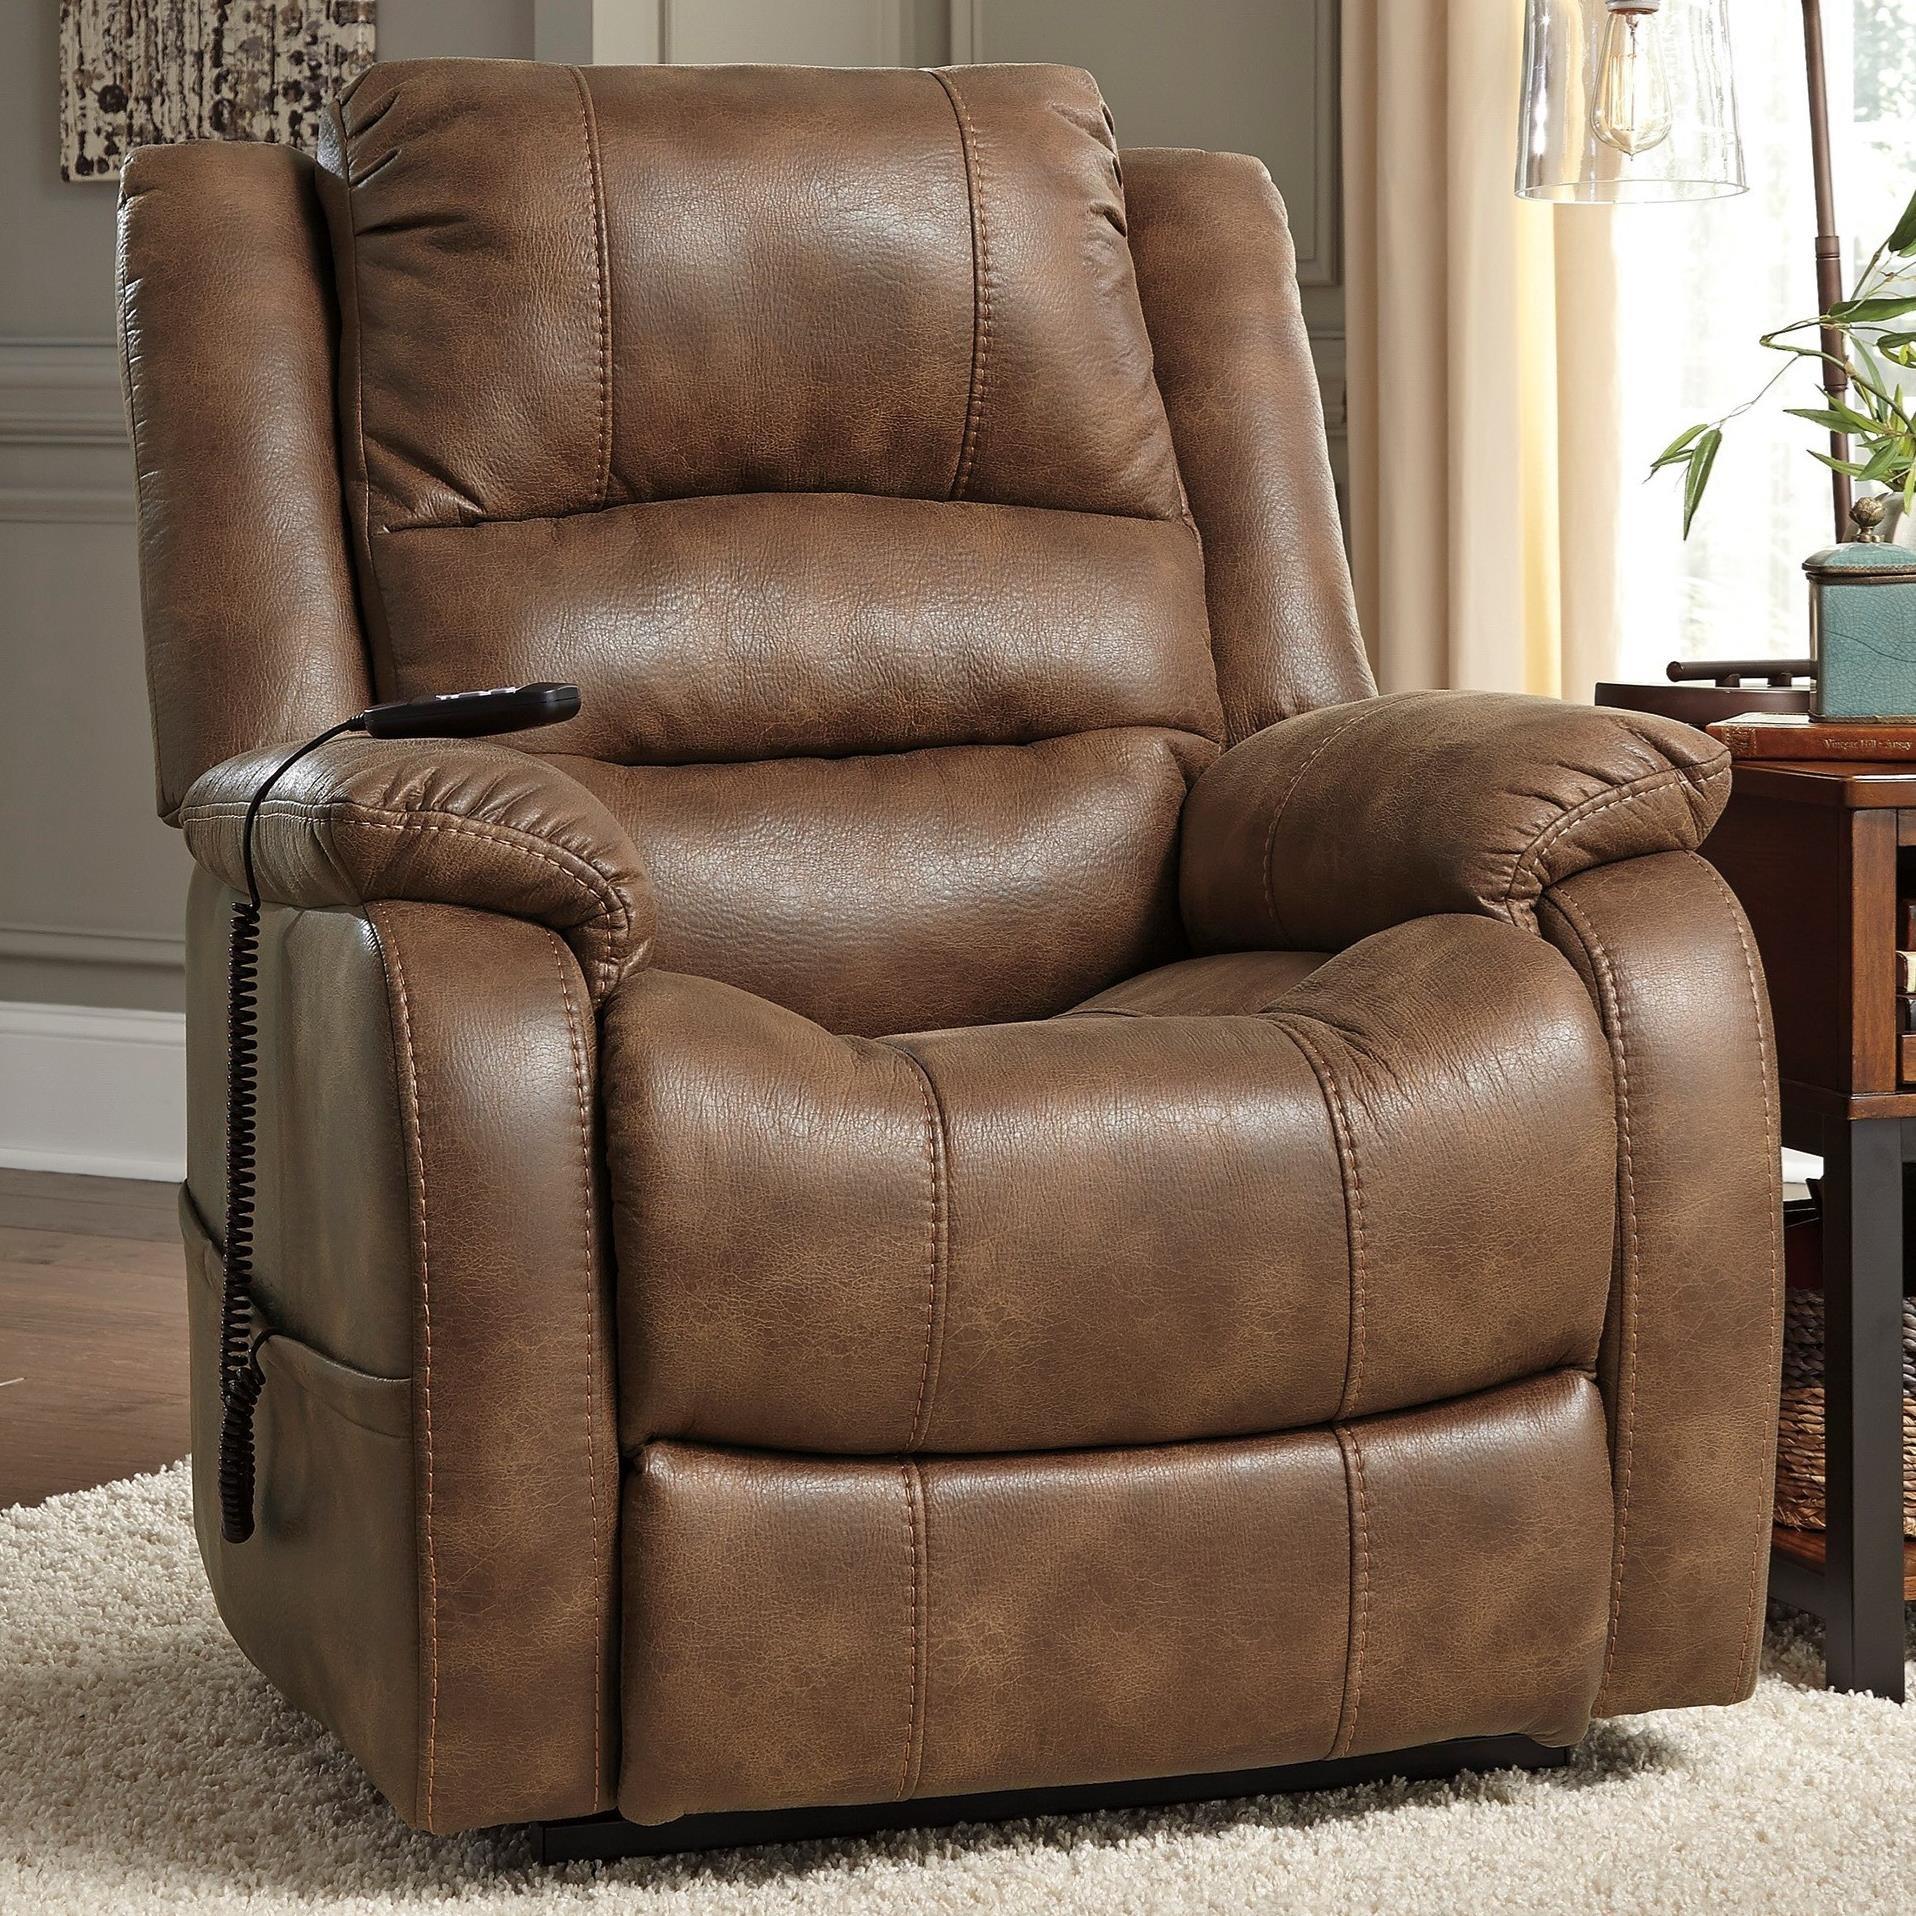 signature design by ashley yandel faux leather power lift recliner rh yumafurniture com